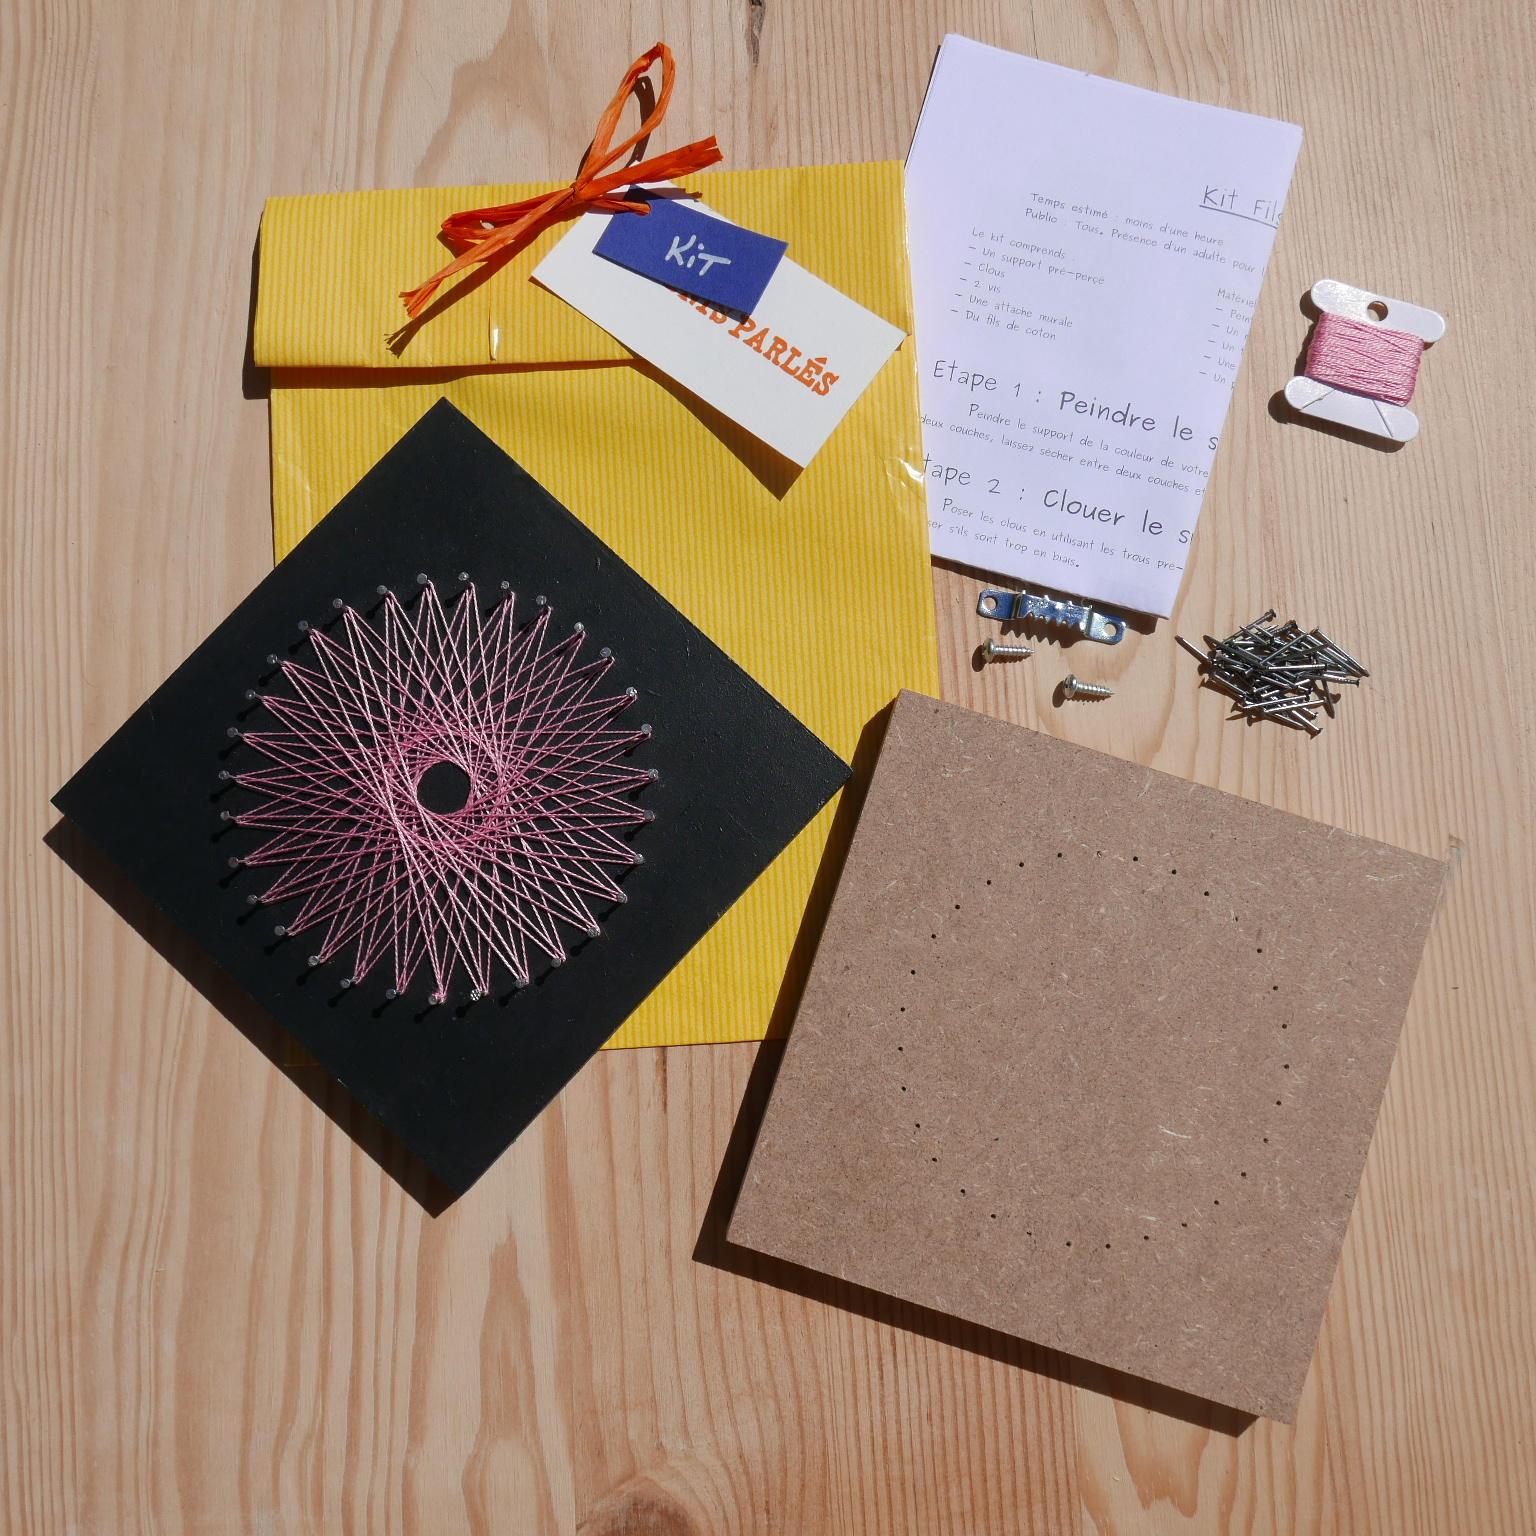 Nett Vintage Draht Kunst Kits Galerie - Der Schaltplan ...